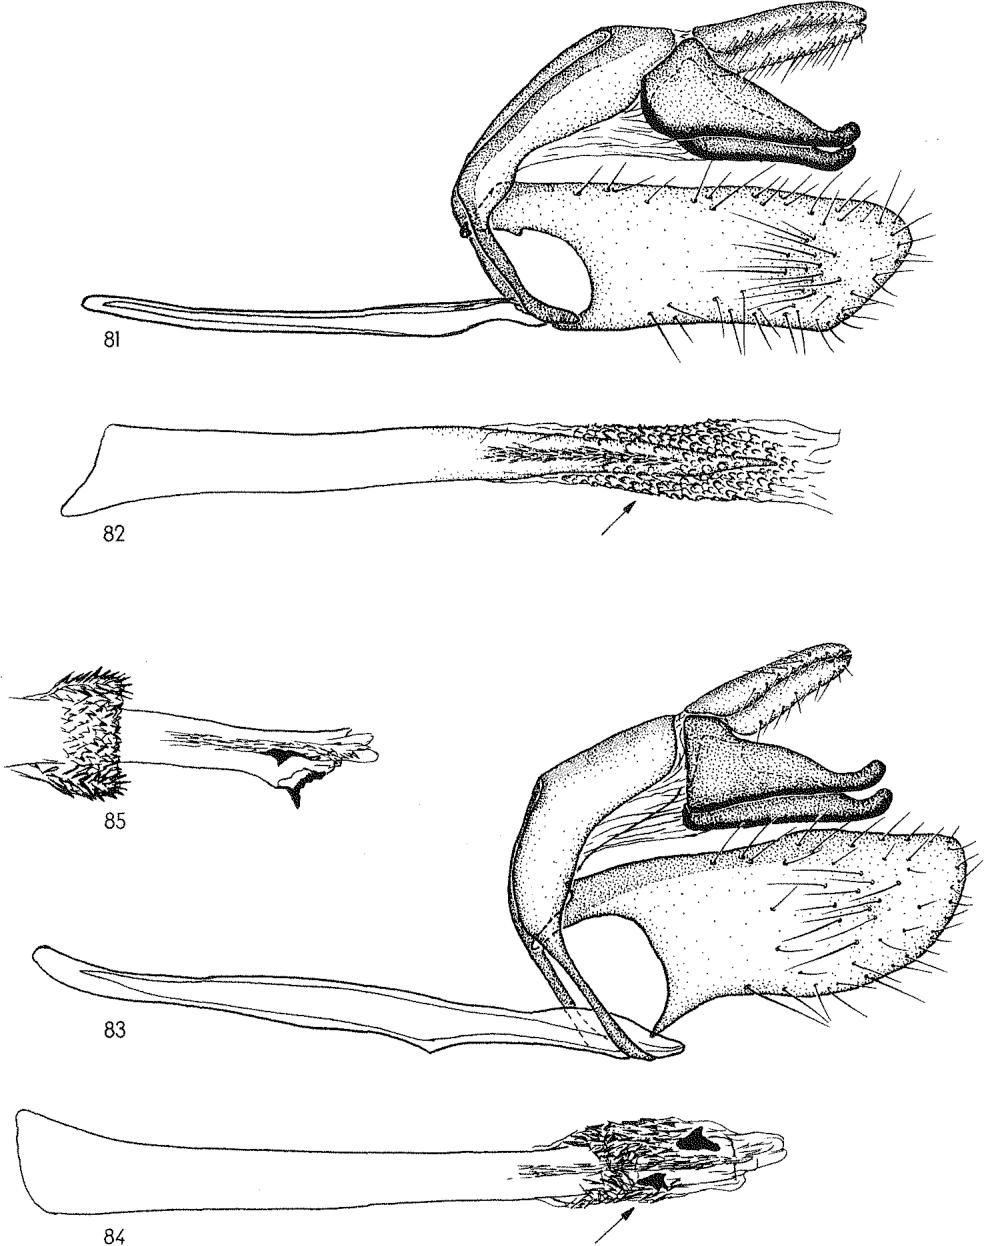 figure 81-82